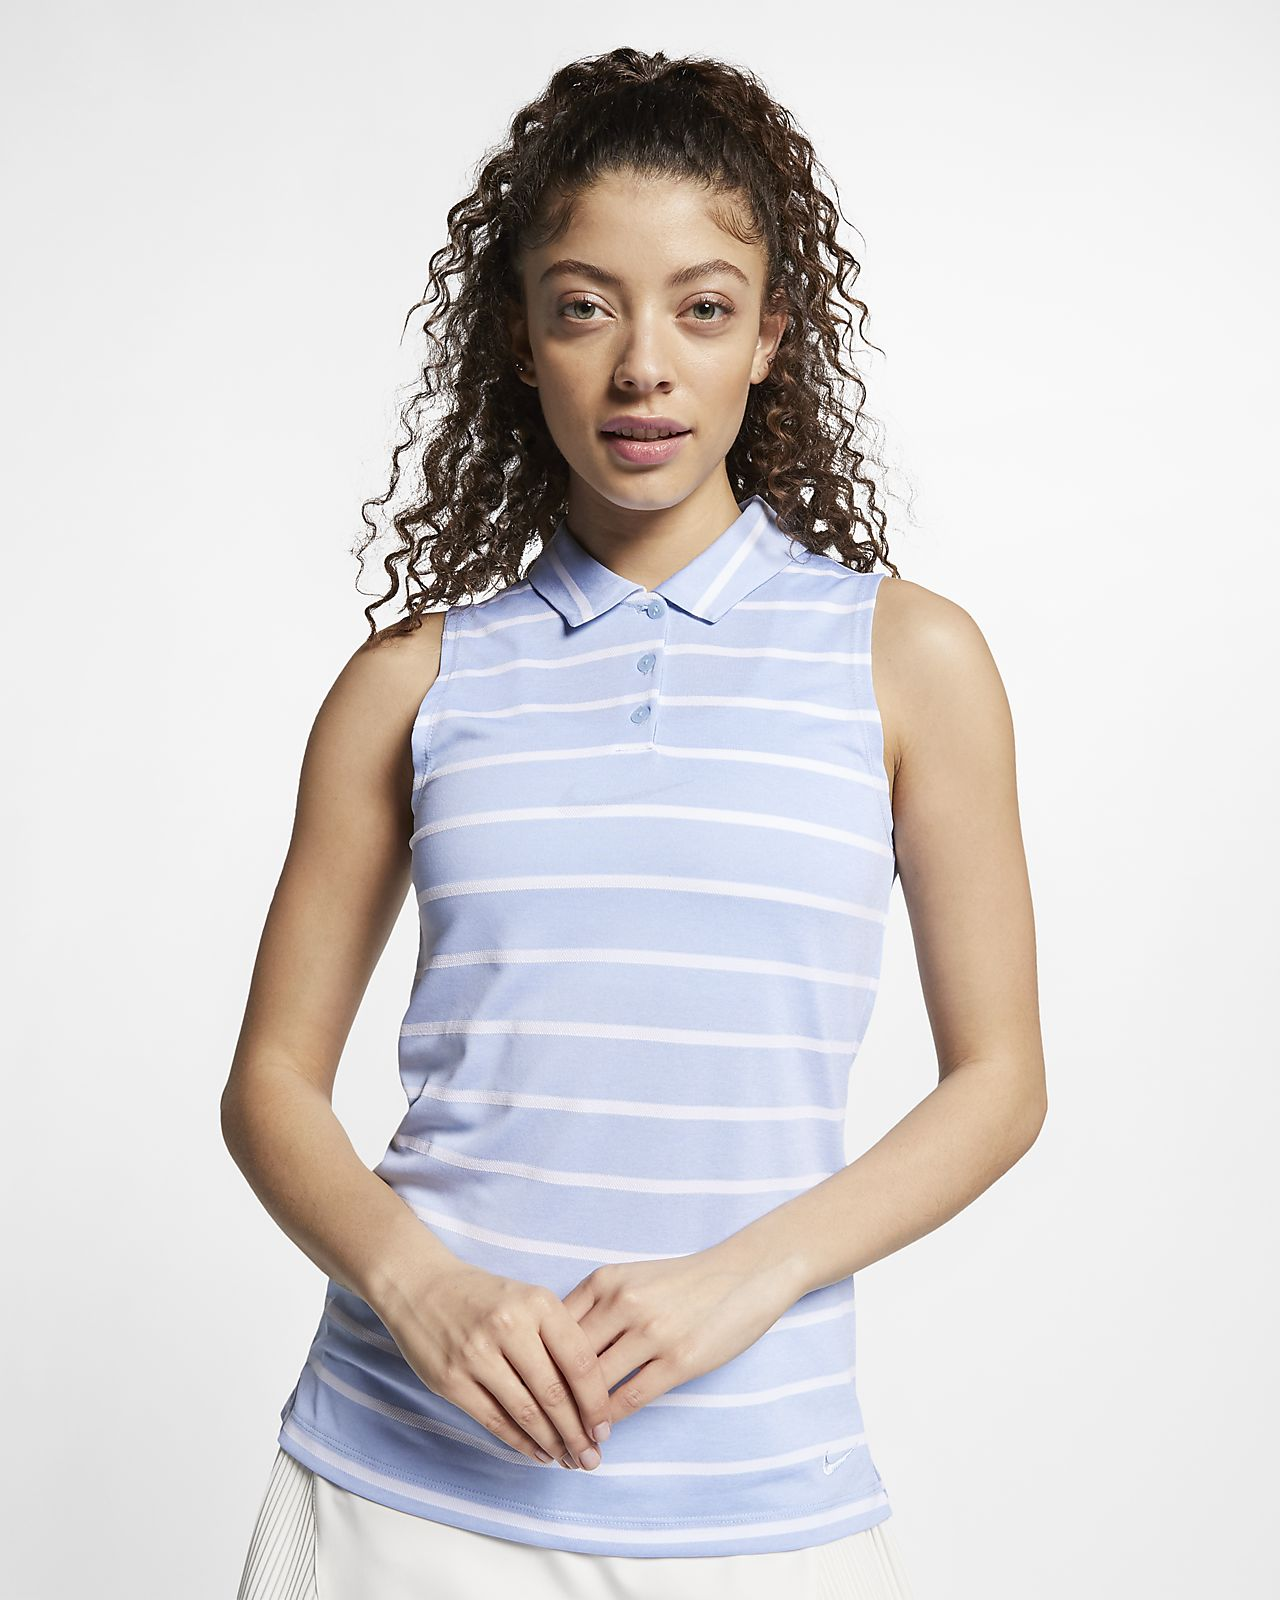 Nike Dri Fit Womens Sleeveless Striped Golf Polo Nike